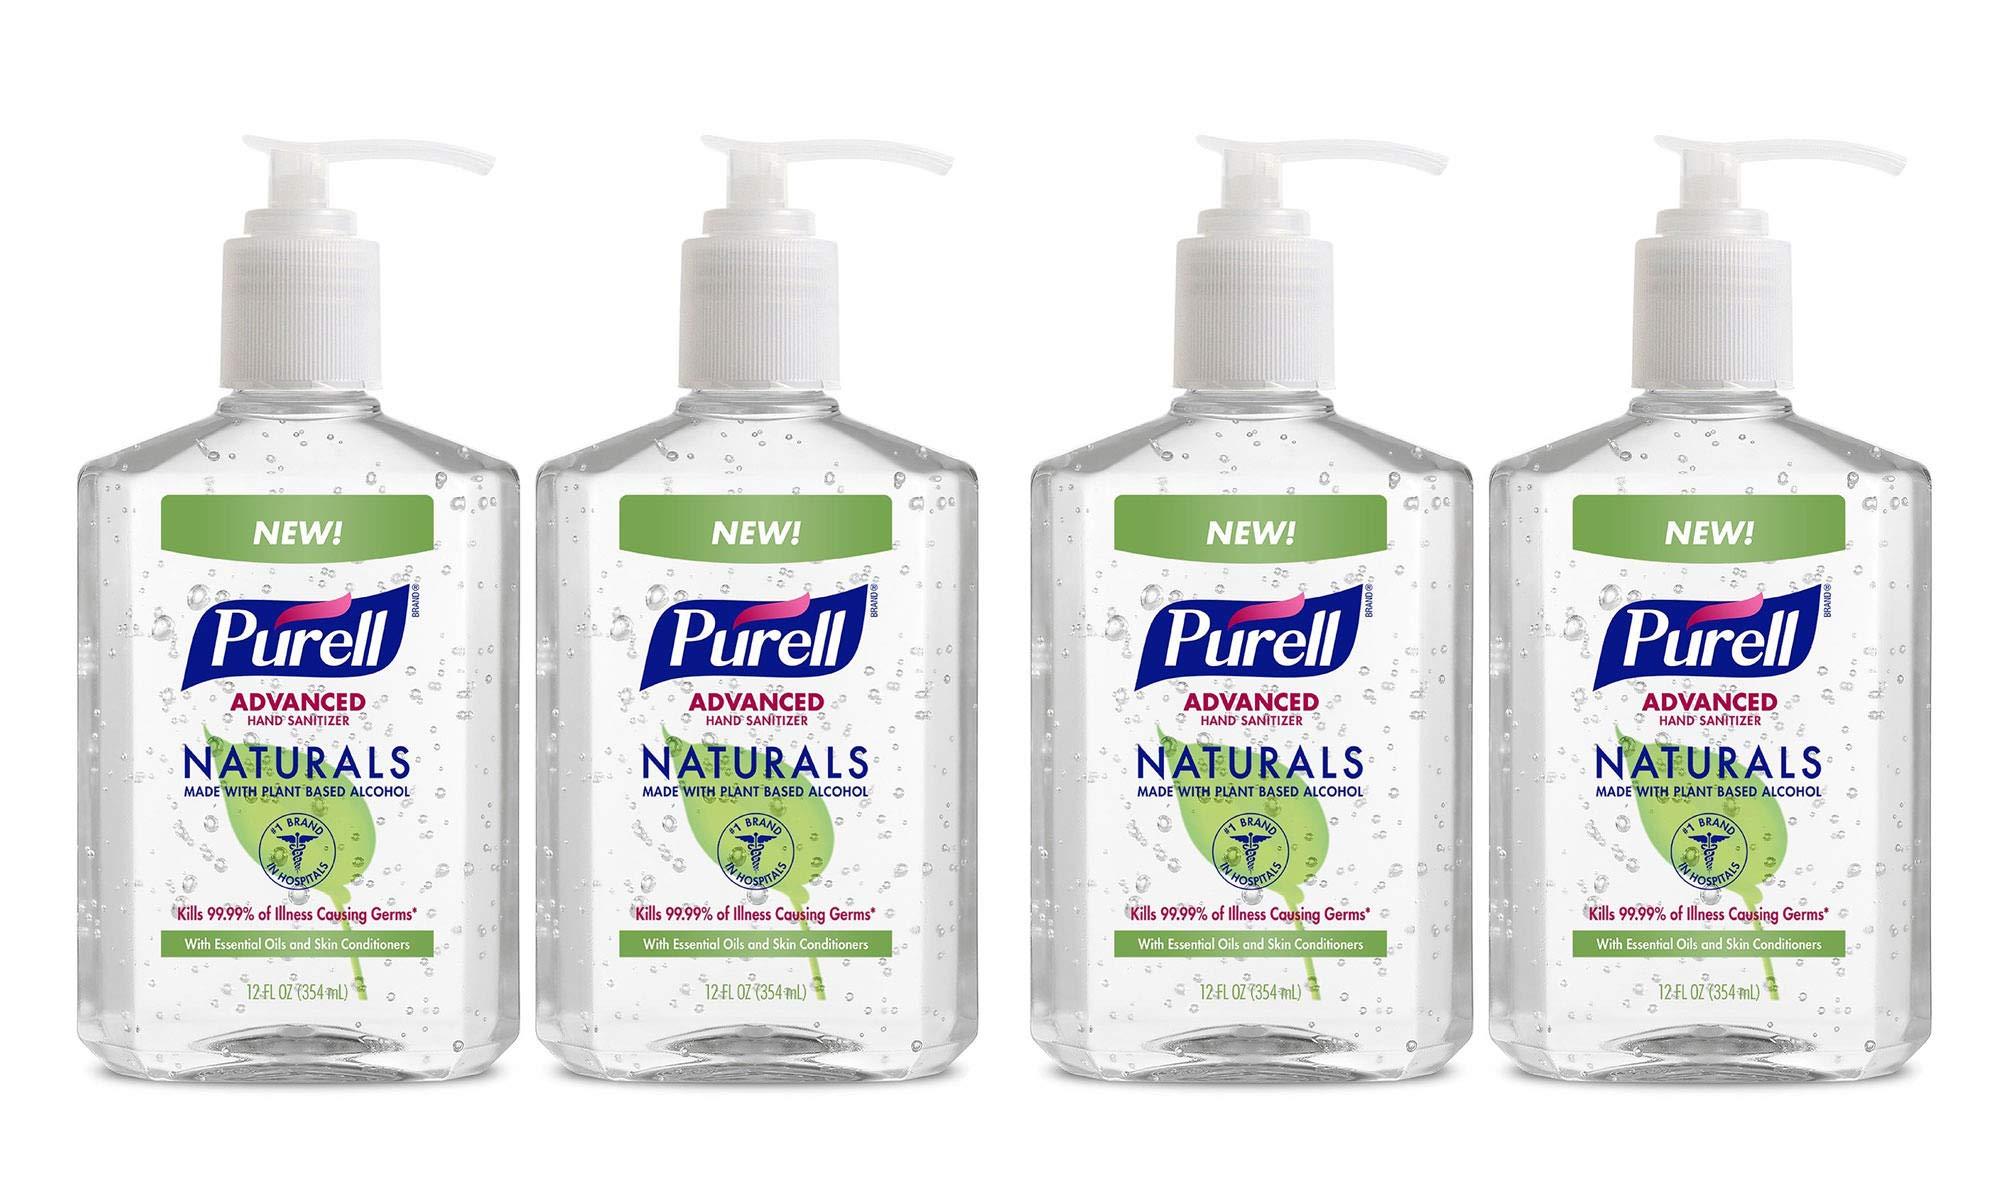 IUYDUH Naturals Advanced Hand Sanitizer - Hand Sanitizer Gel with Essential Oils, 12 fl oz Pump Bottle (Pack of 2) - 9629-06-EC 4 Pack